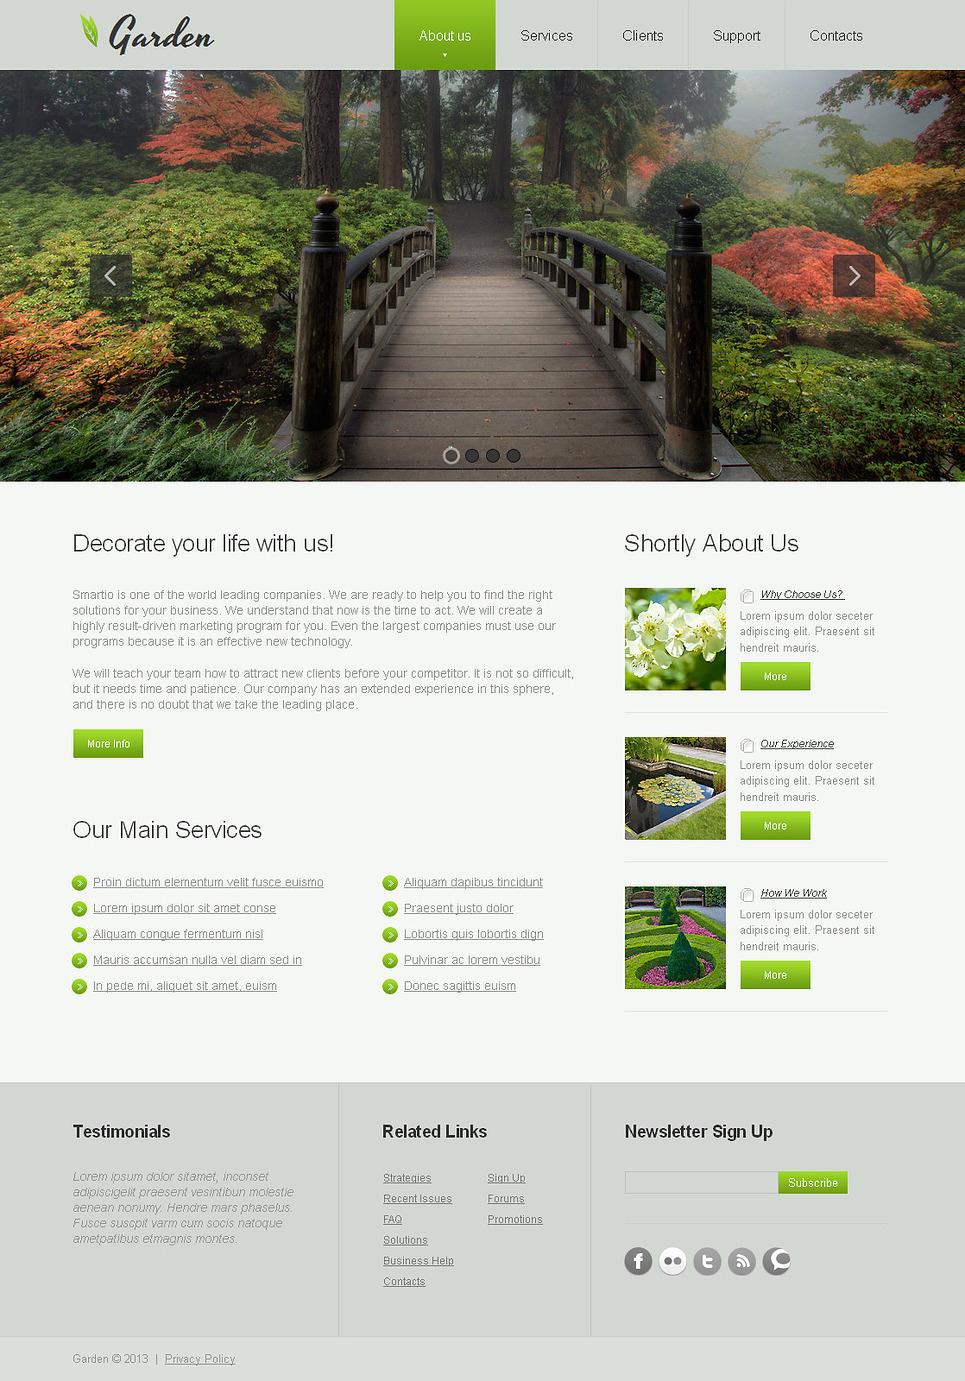 Exterior Design Web Template with Big Image Slider - image